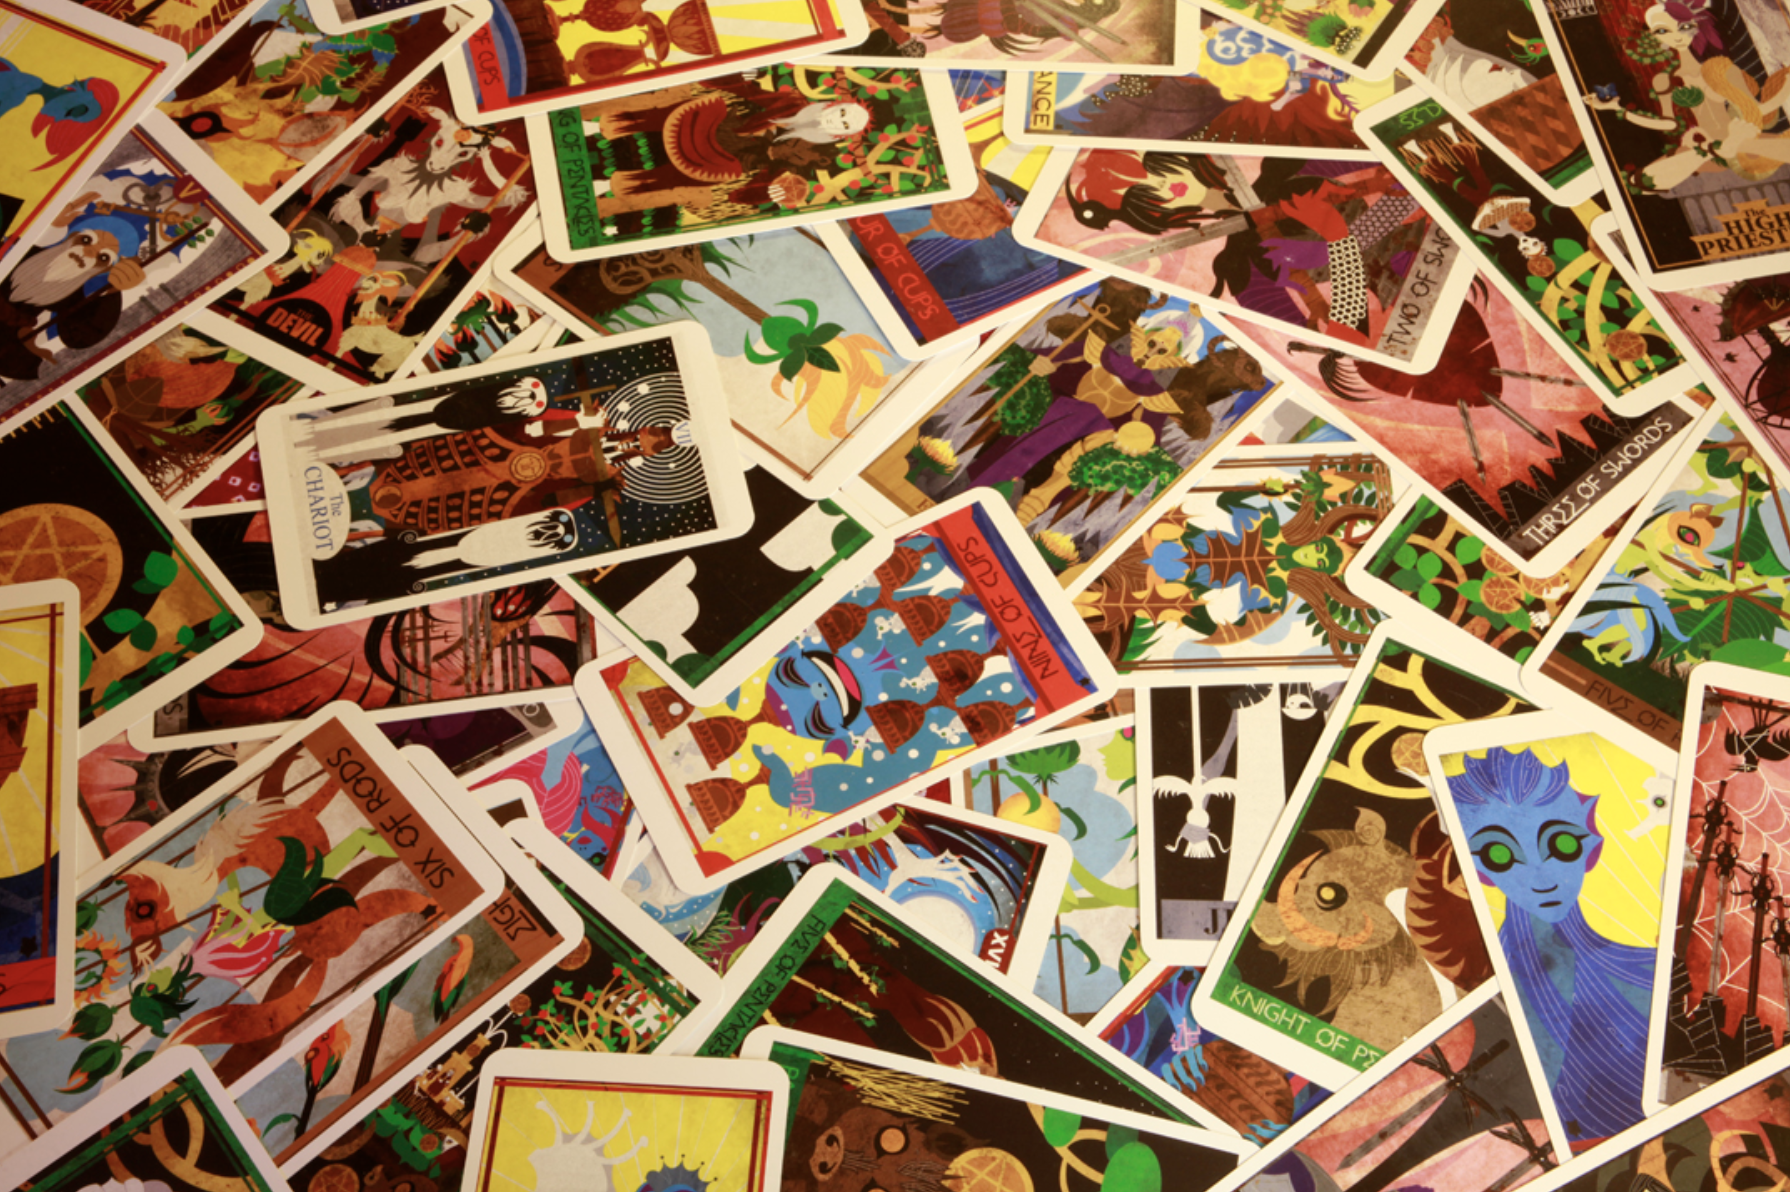 The Best Tarot Decks, According To Astrologers - VipScandals